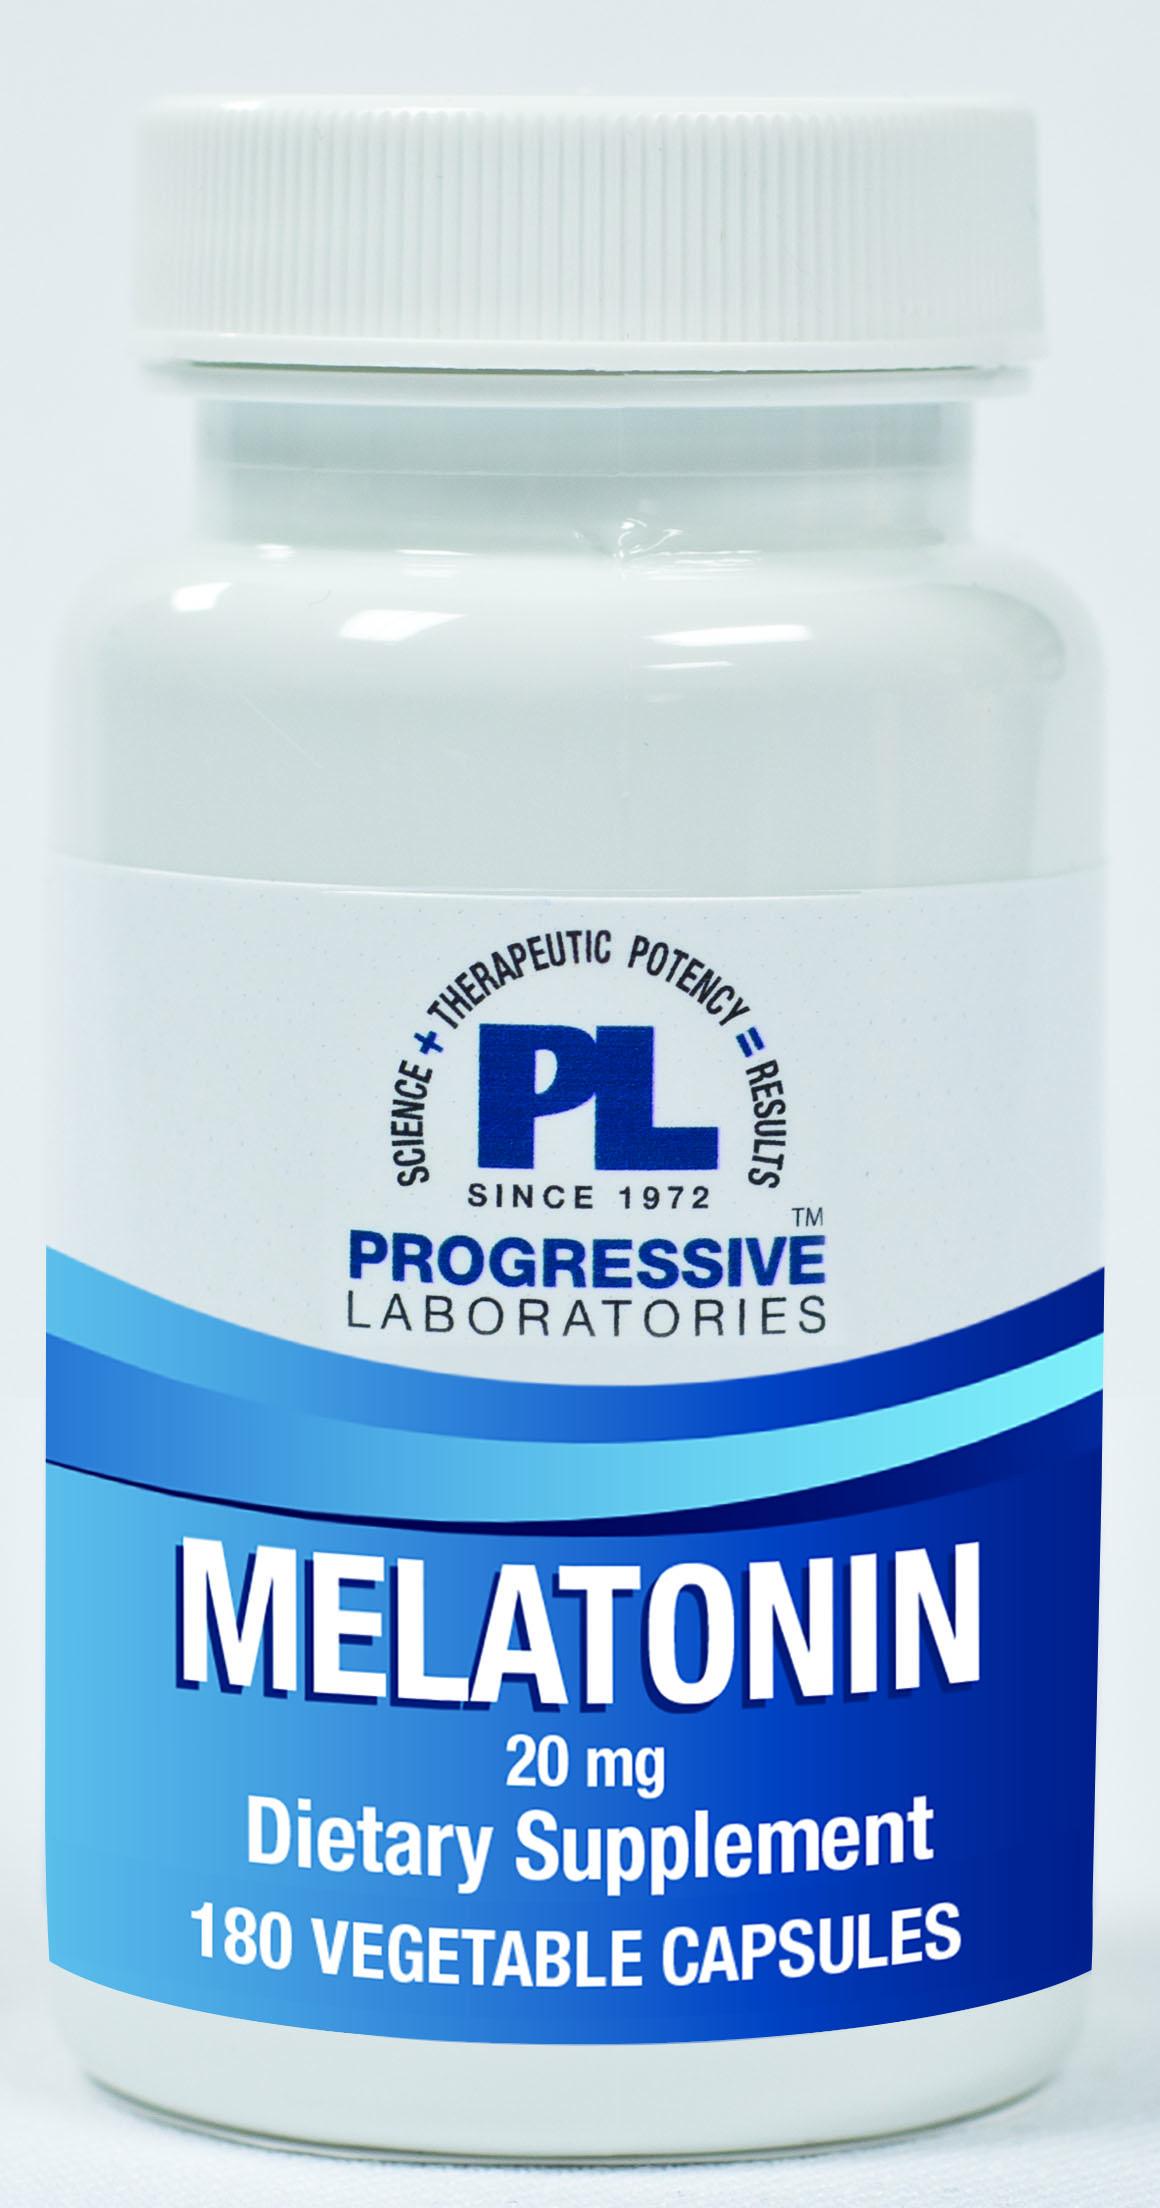 Melatonin 20 - 180 Capsules